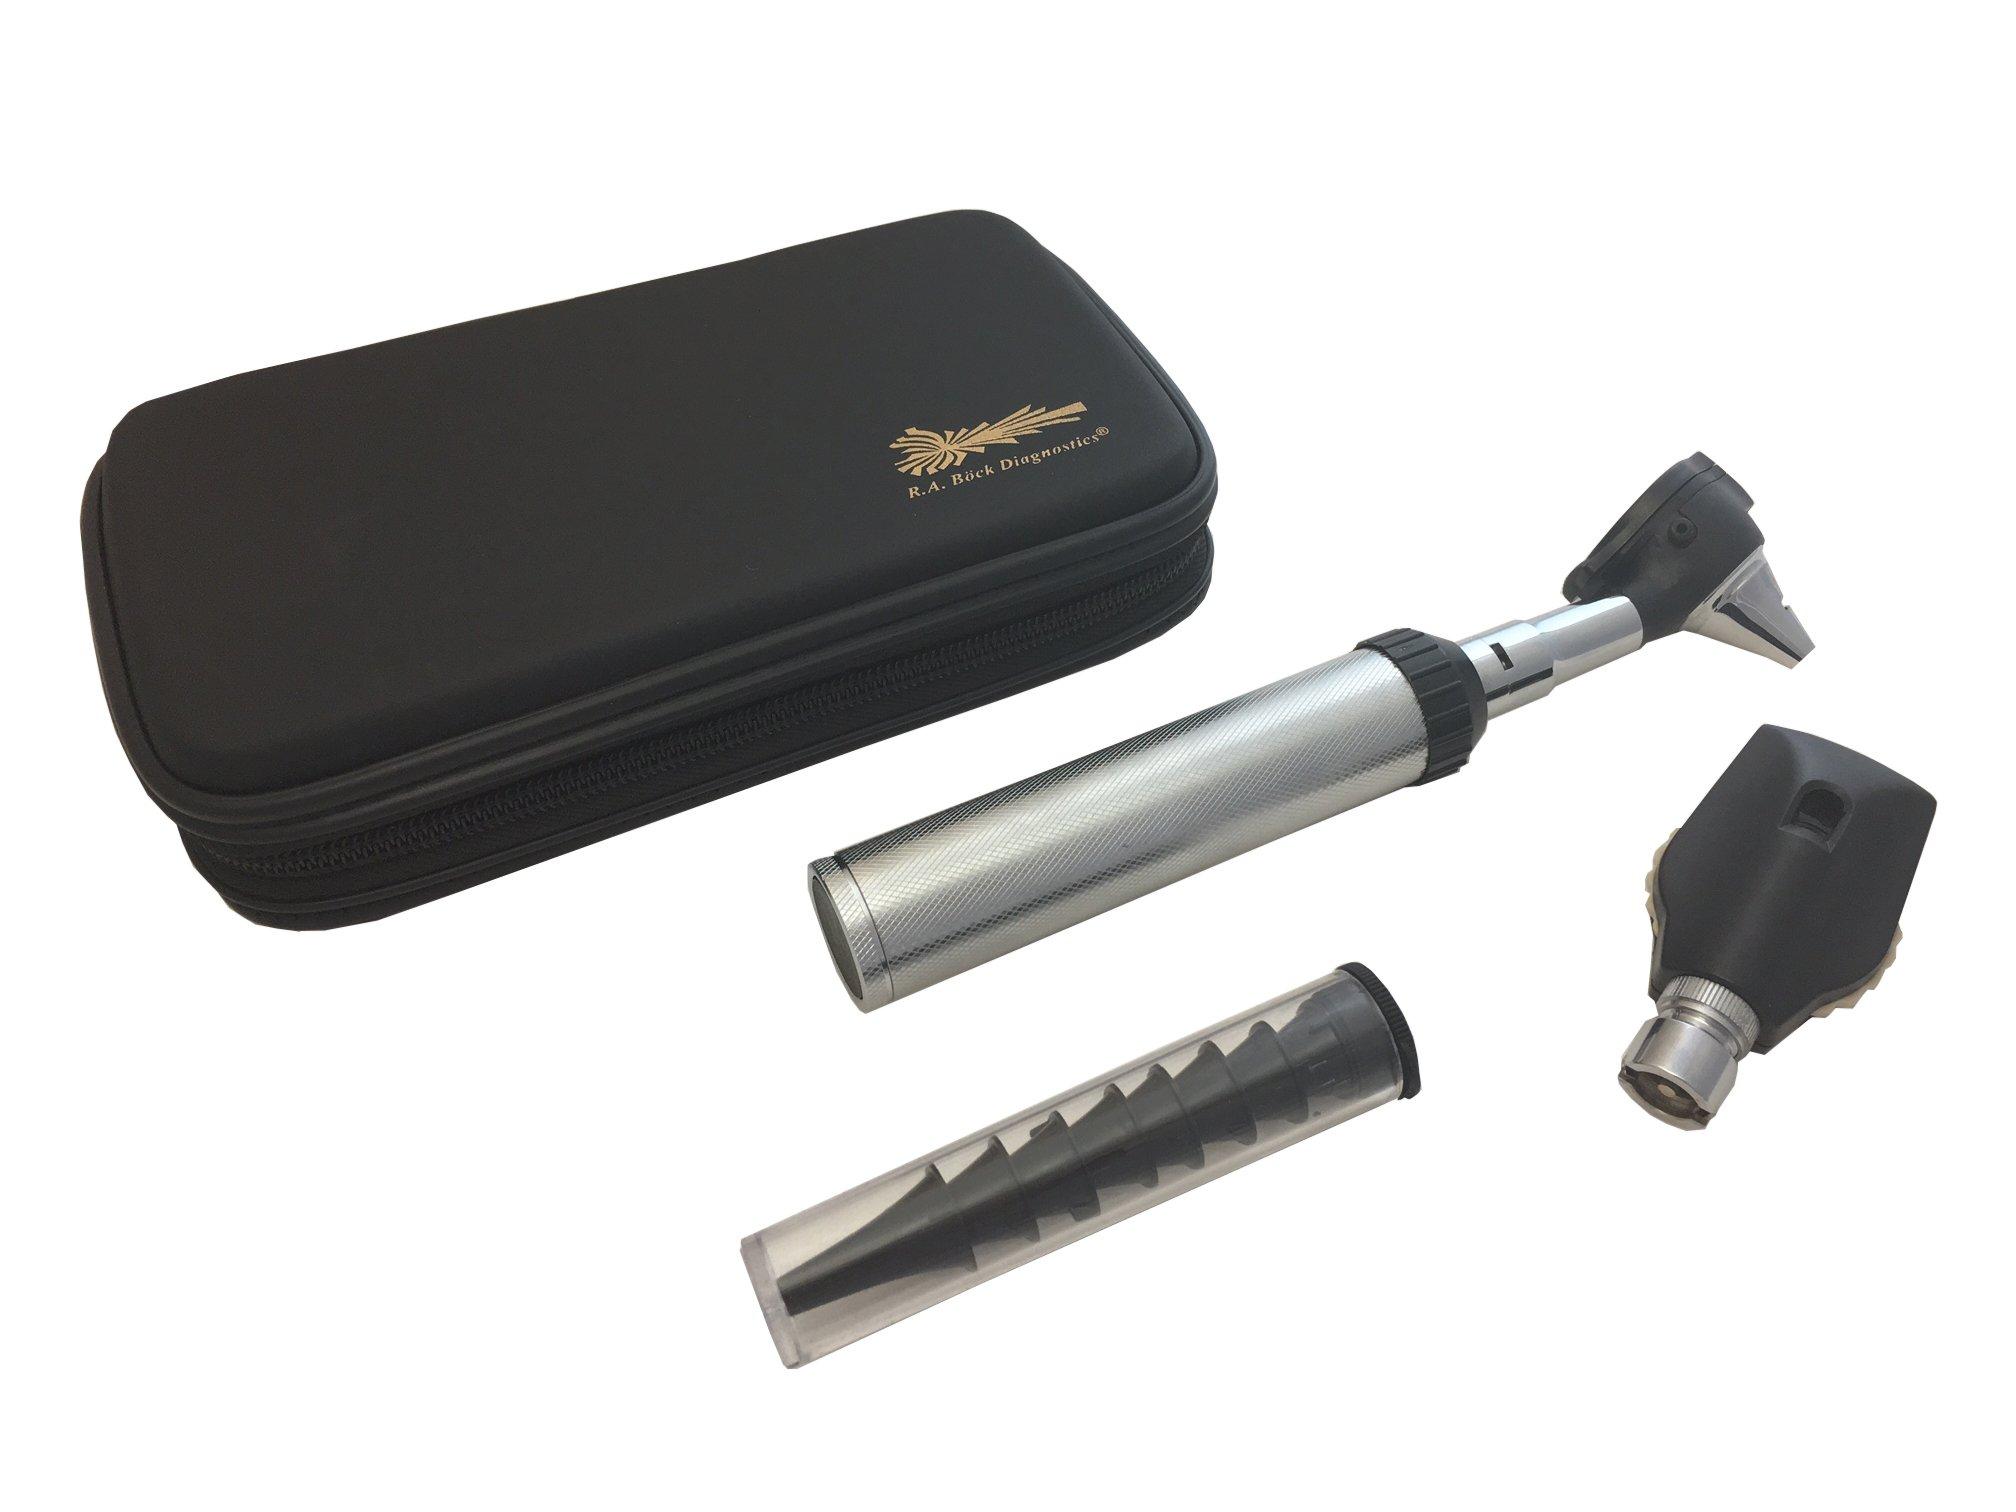 RA Bock Diagnostics Fiberoptic LED Otoscope Kit in Newest Tortoise Shell Case - The Perfect Kit for Medical Students! by RA Bock Diagnostics (Image #1)